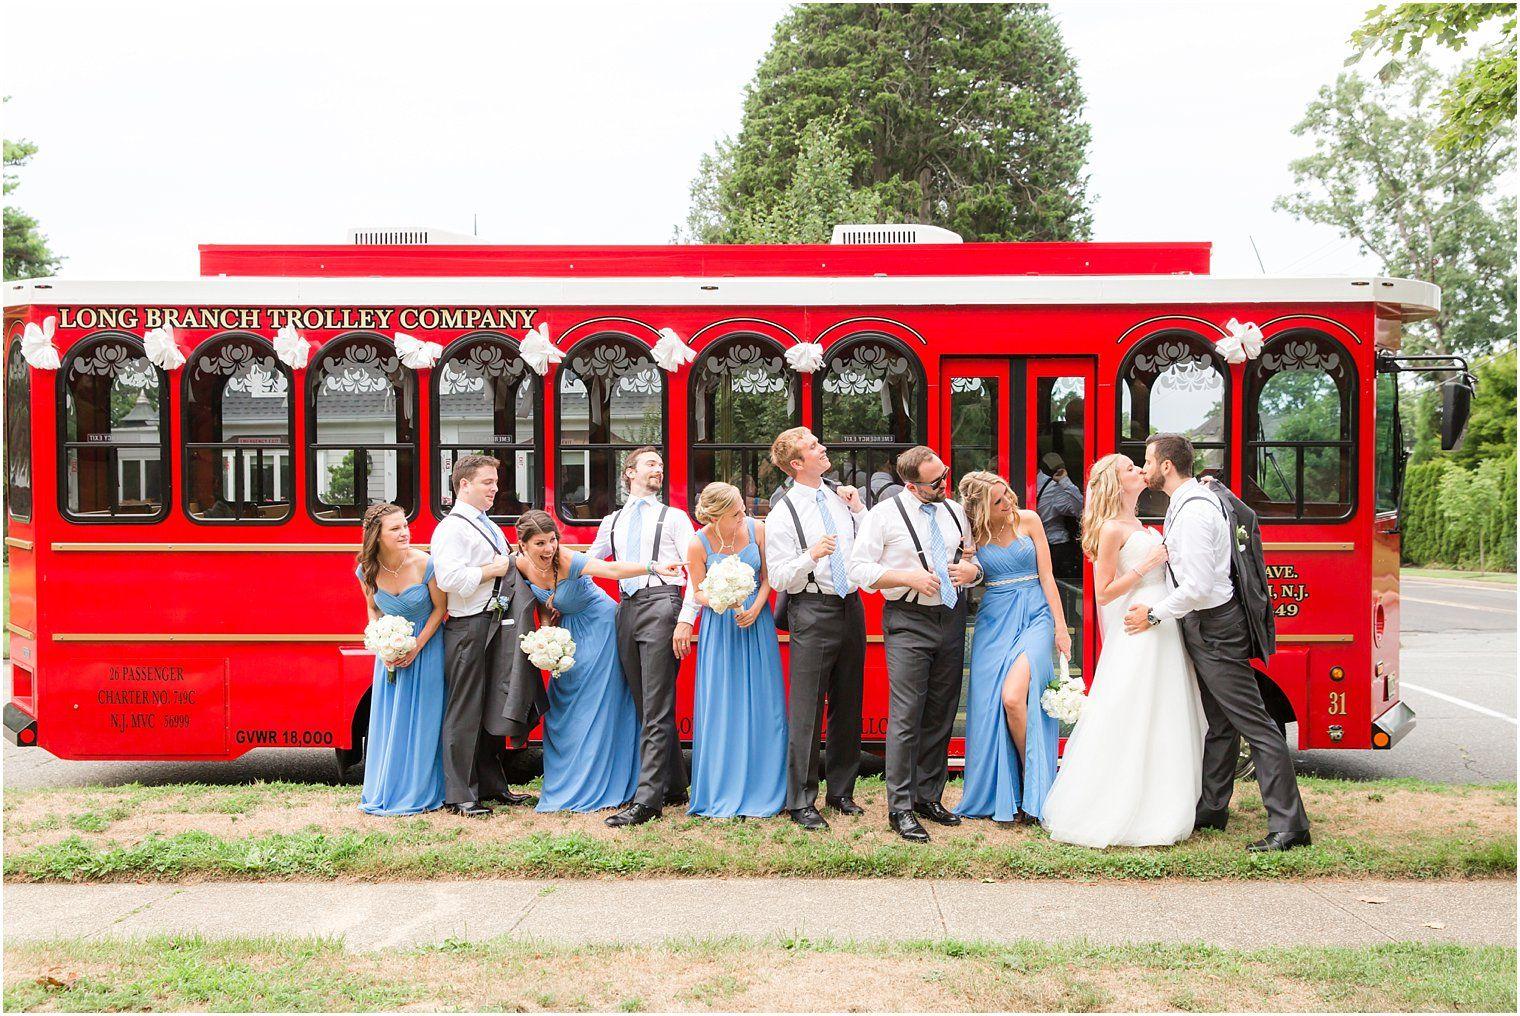 Long Branch Trolley Company Trolley Service for Weddings